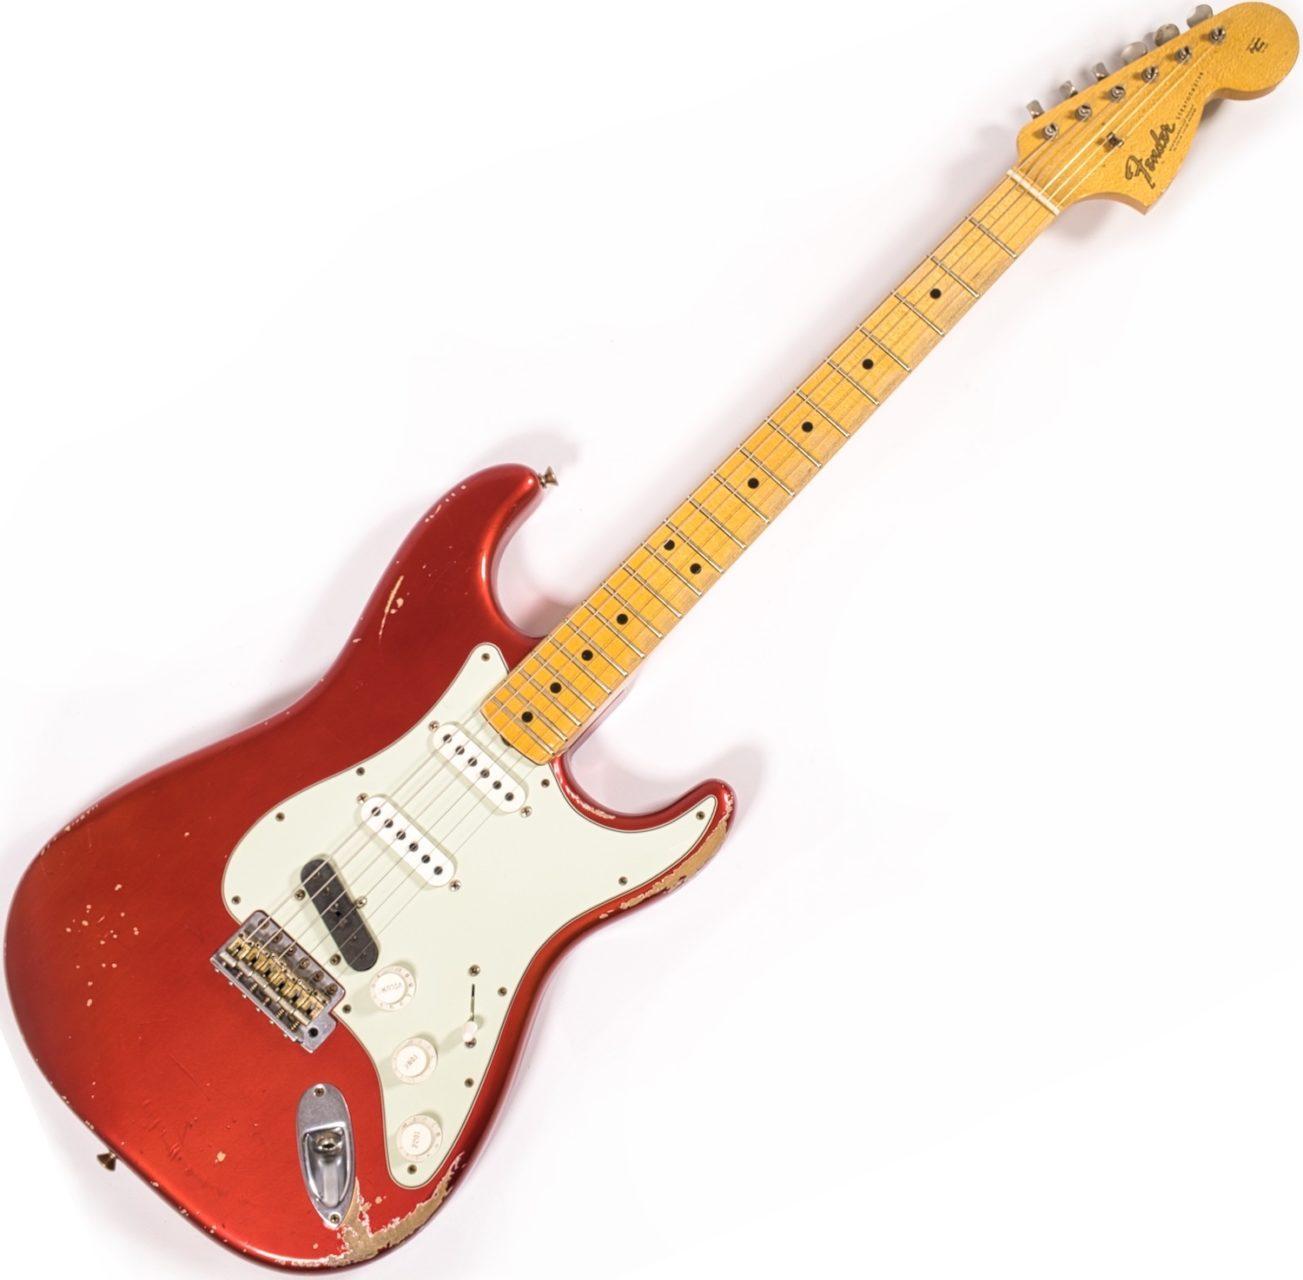 2014 Fender Custom Shop Masterbuilt Dennis Galuszka 66 Stratocaster